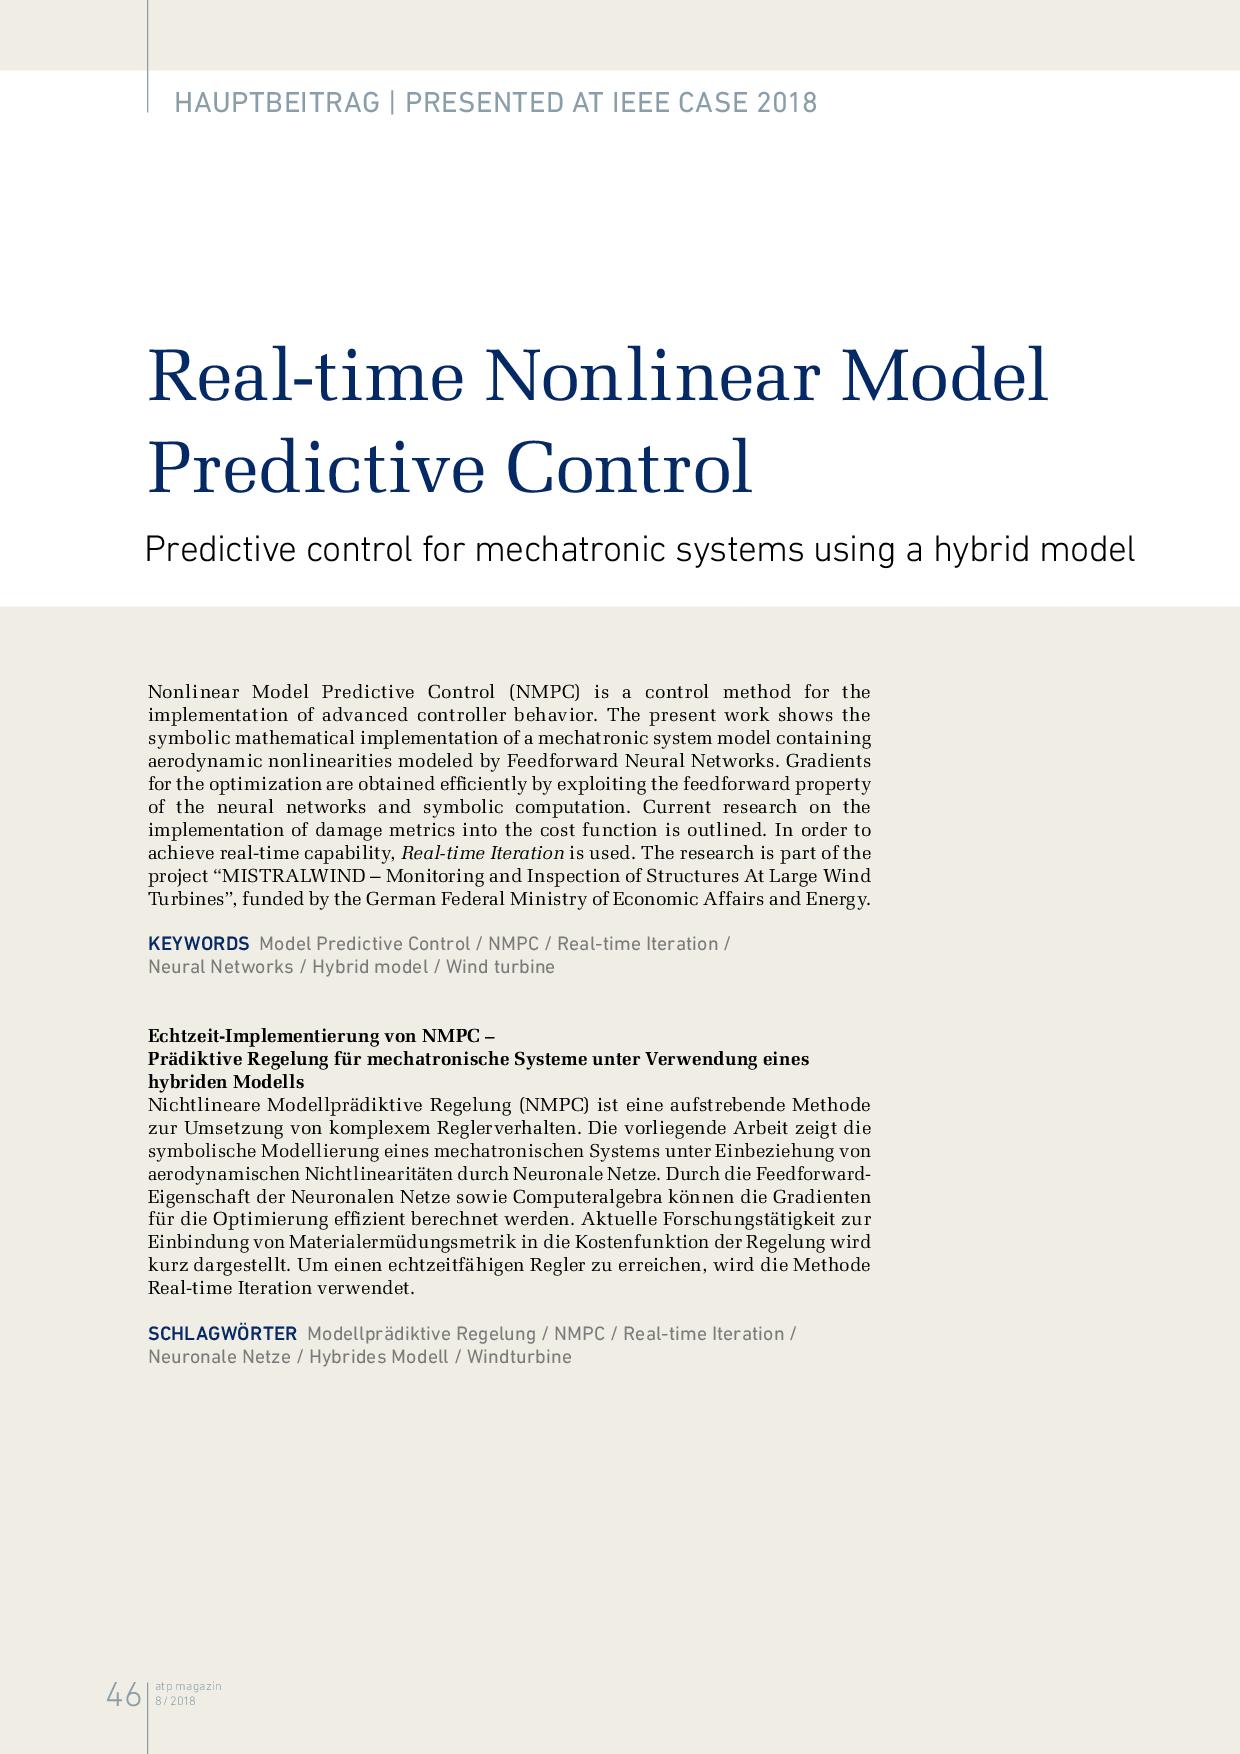 Real-time Nonlinear Model Predictive Control